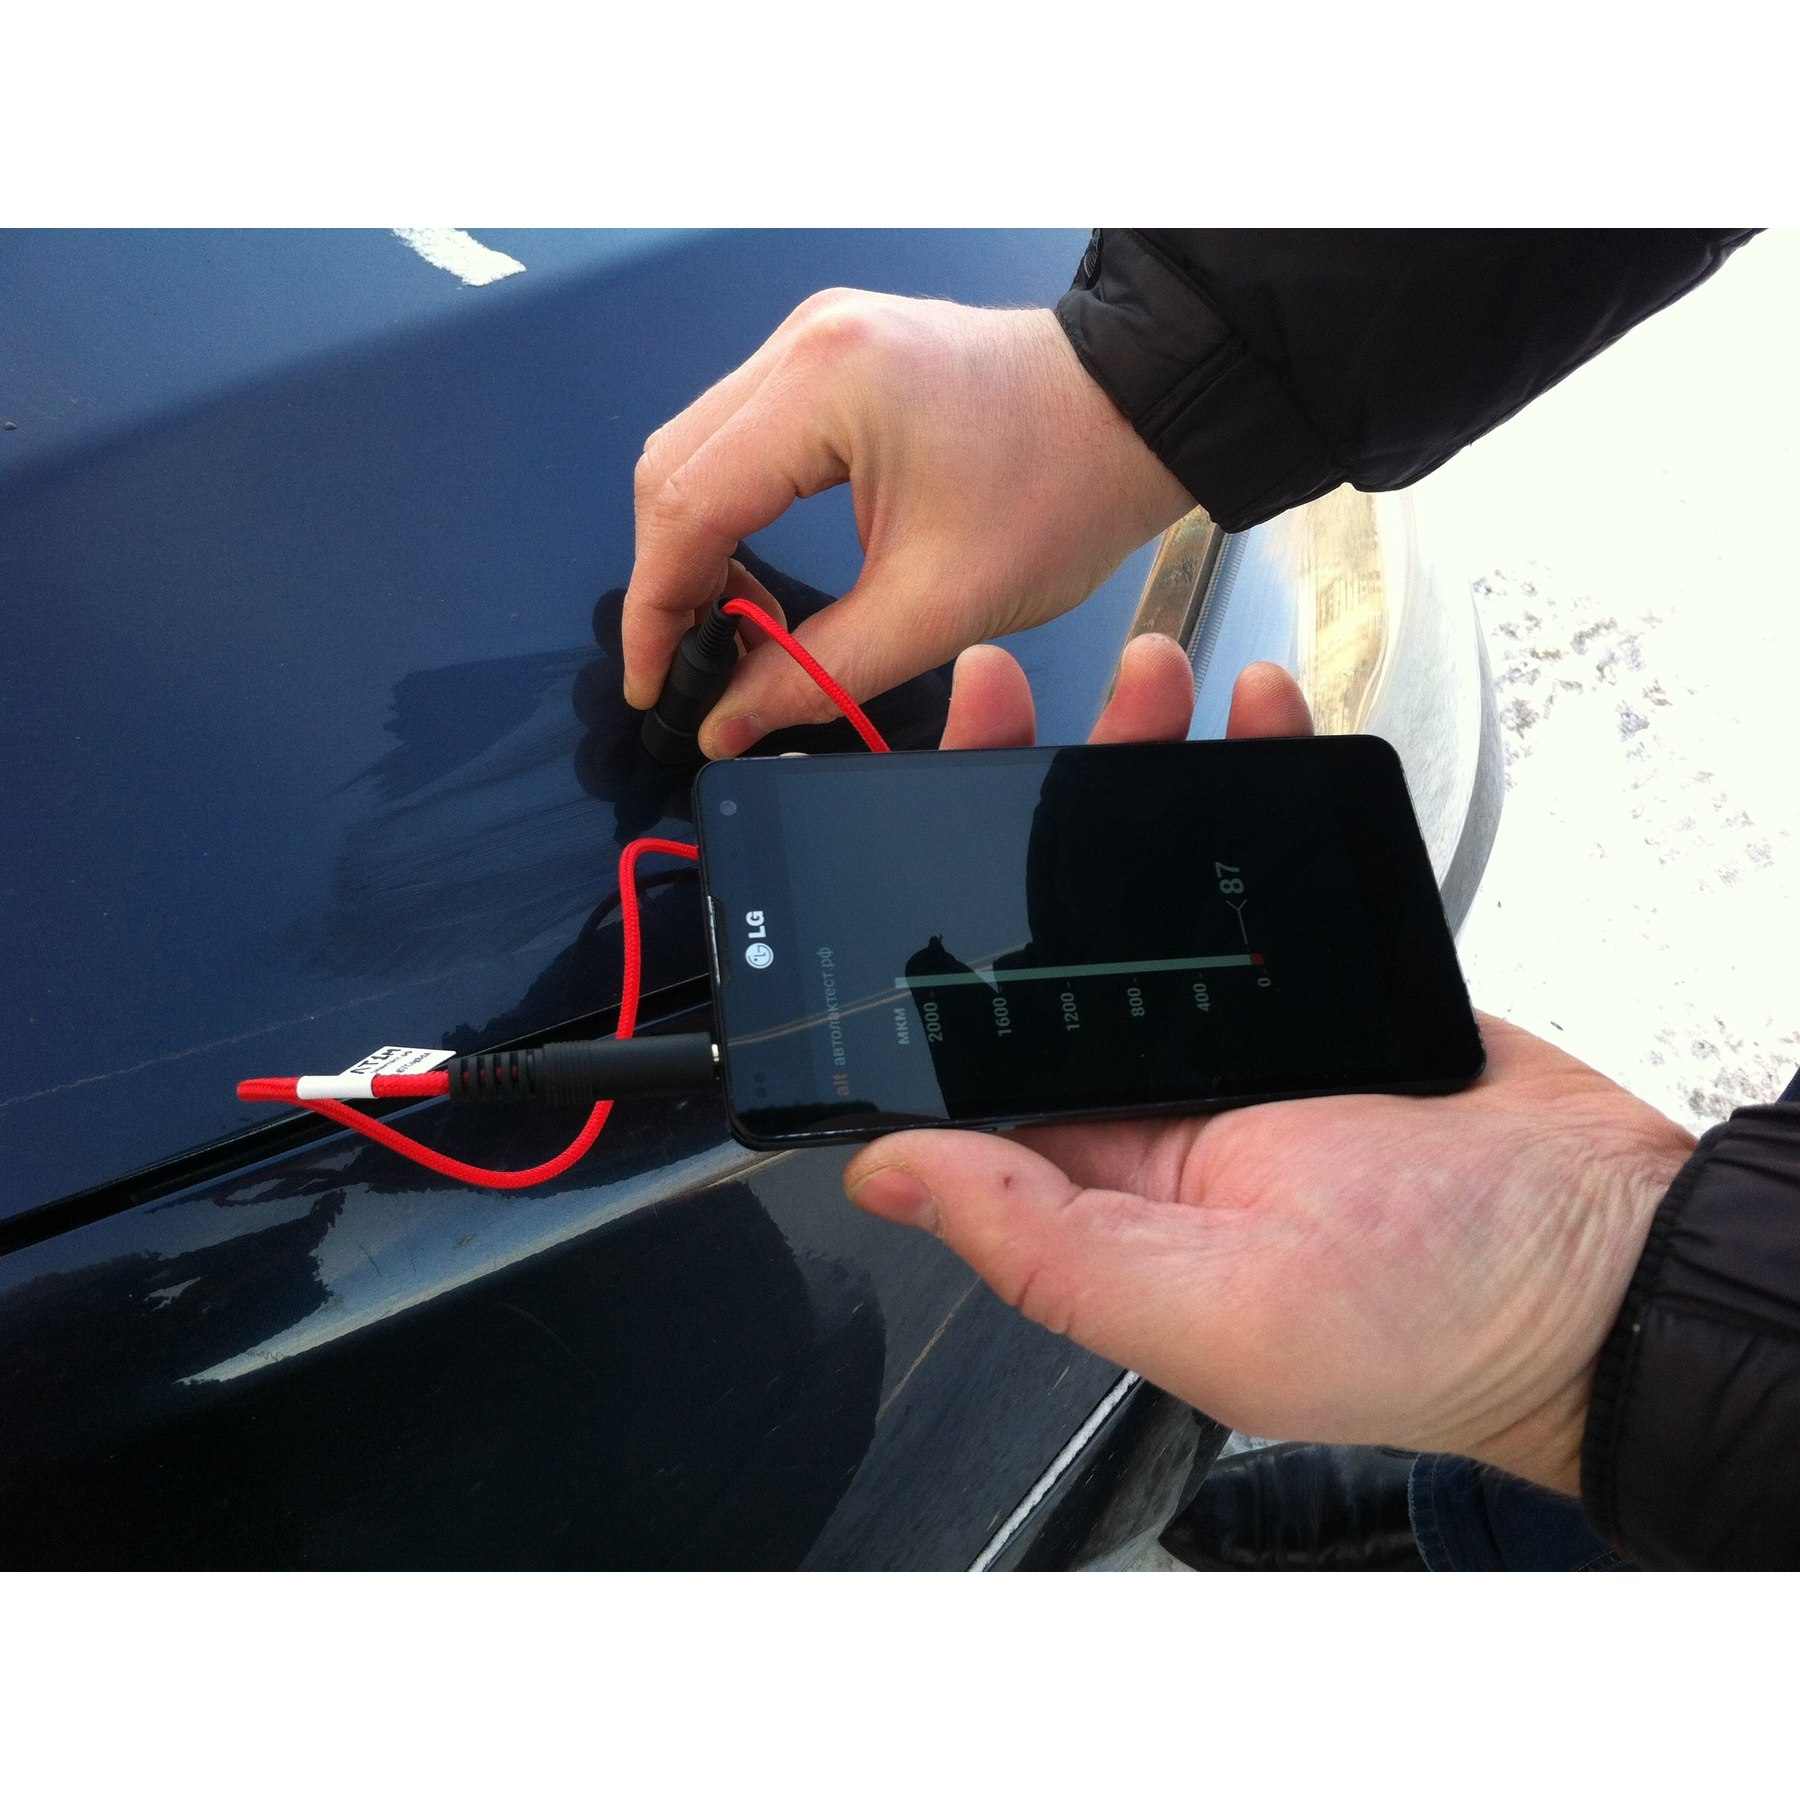 Автолактест Avtolaktest NEW Professional Paint Film Thickness Meter 3,5mm Jack IPhone Android ALT1-M Alt1m